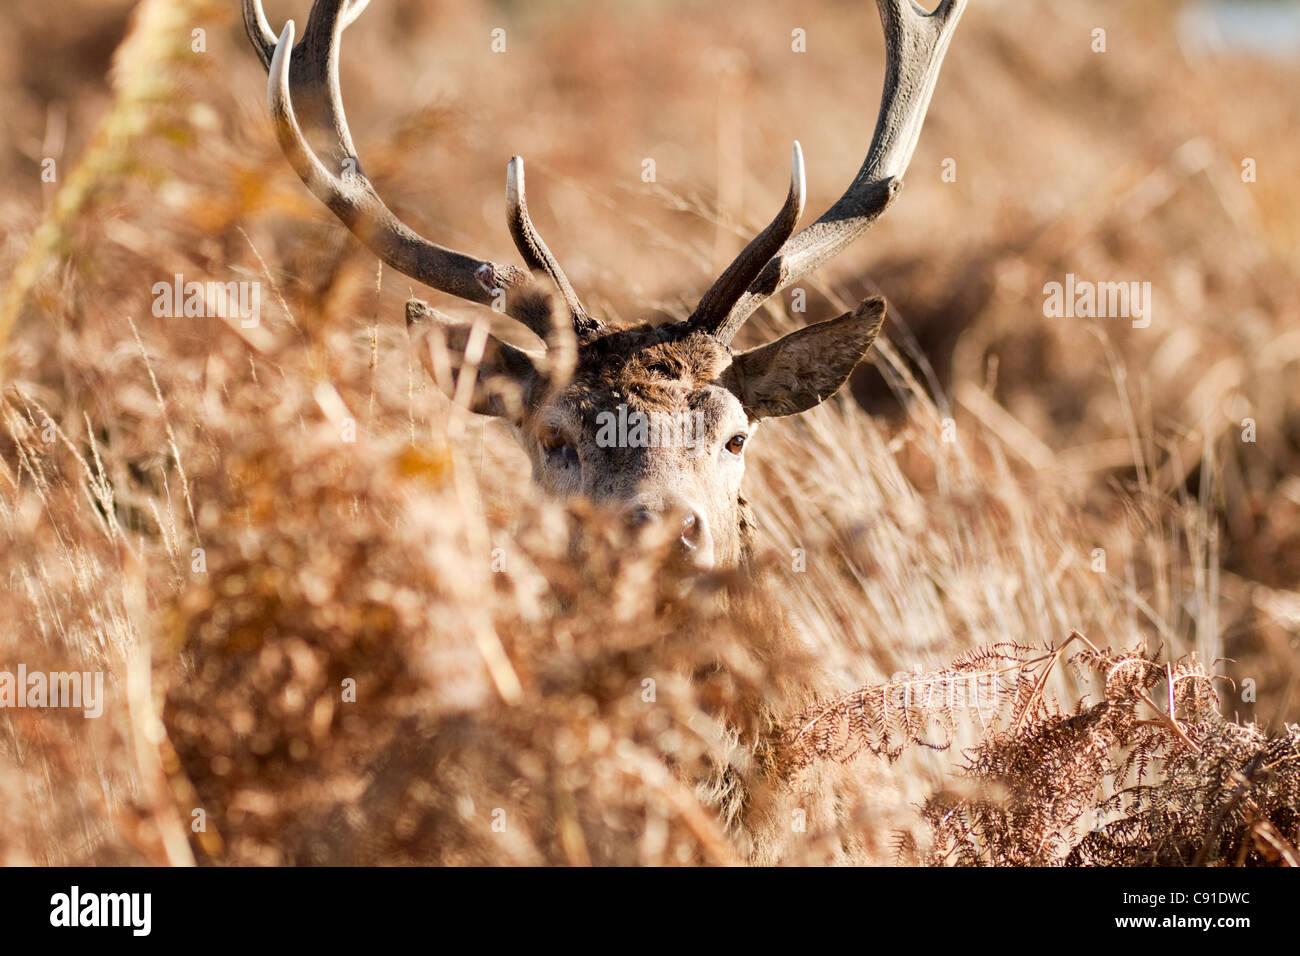 Red deer stag, Curvus elaphus, Richmond park, autumn/fall, Surrey, England, UK - Stock Image